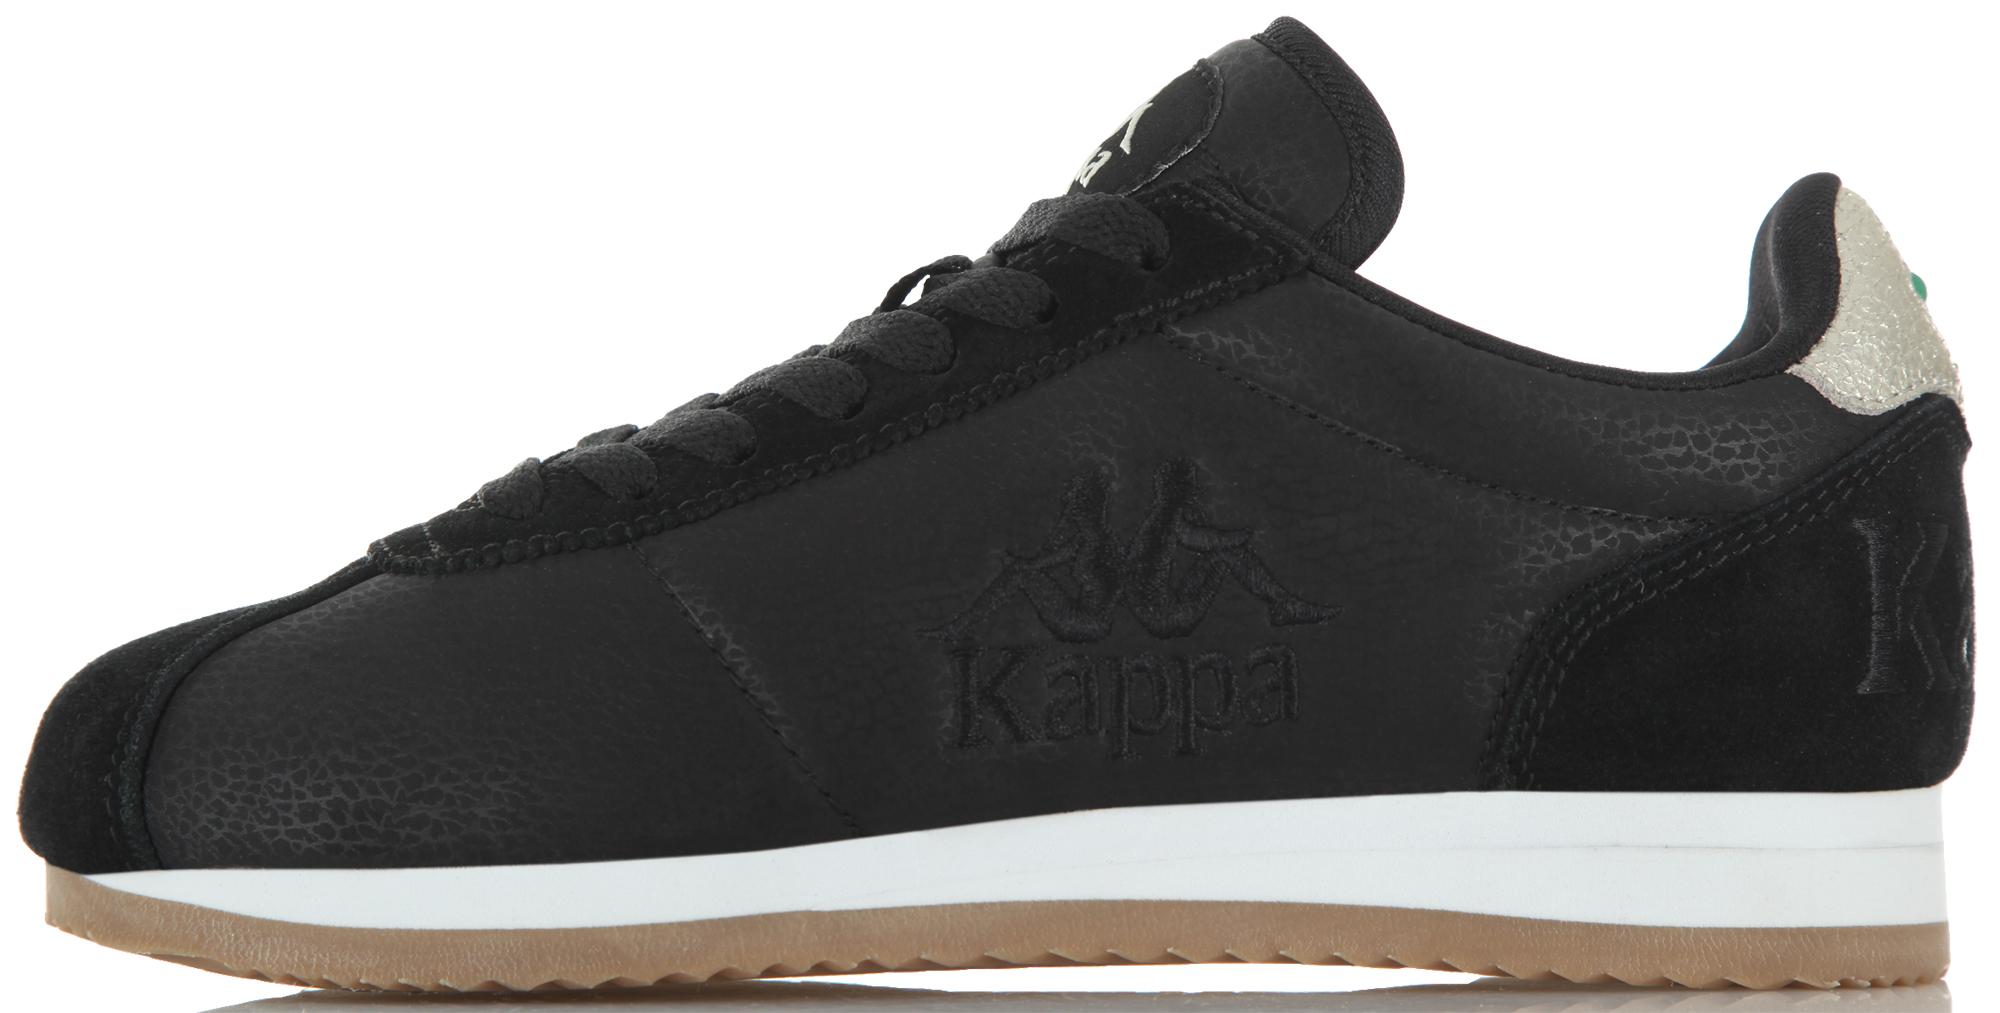 Kappa Кроссовки женские Kappa Alfa, размер 40 kappa кроссовки женские kappa linea